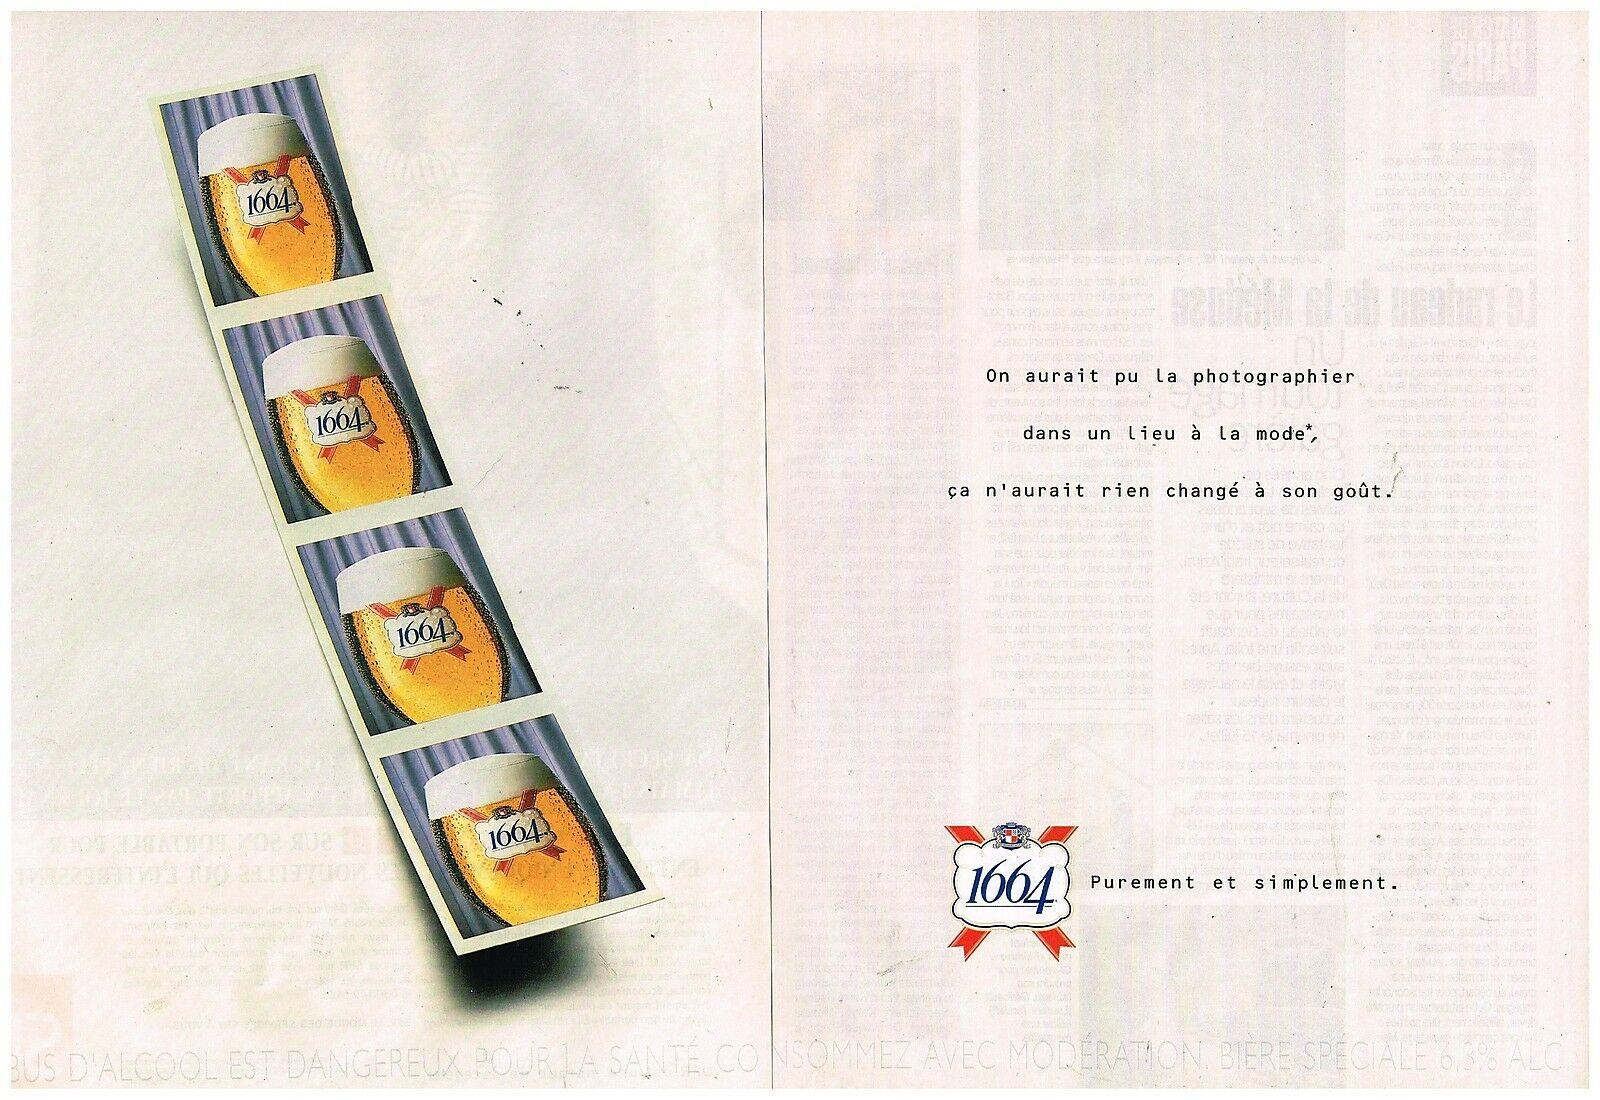 1998 biere 1664 A3